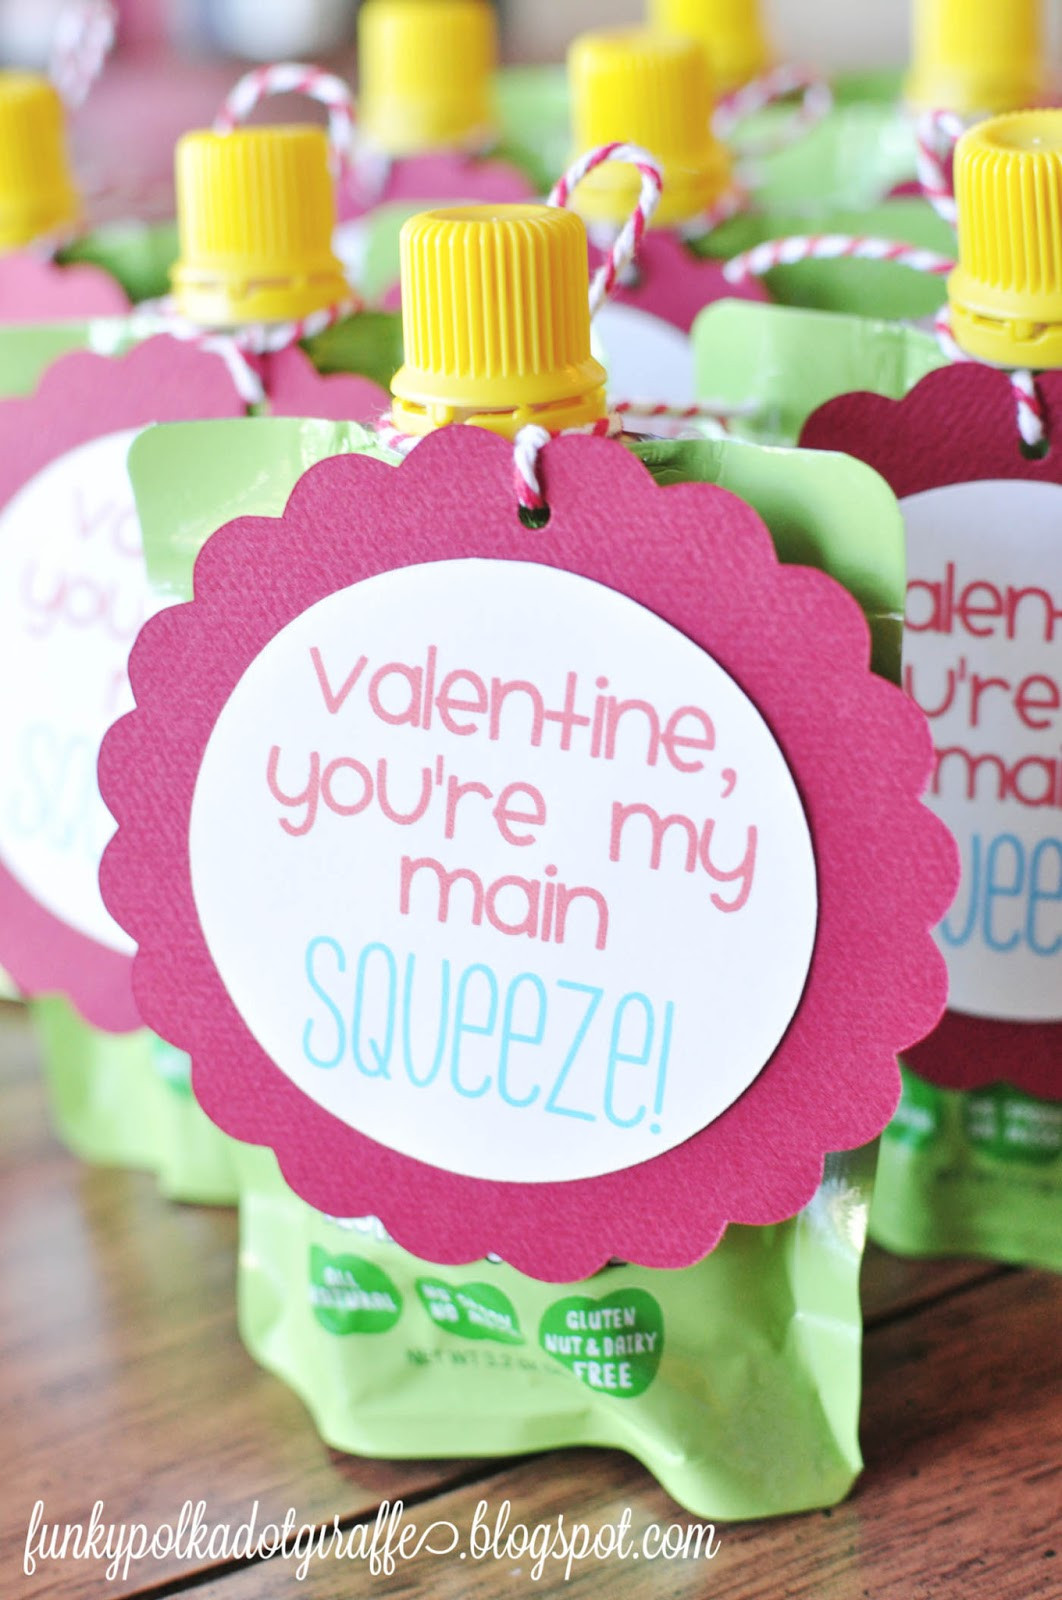 Valentine Gift Ideas For Kids  Funky Polkadot Giraffe Preschool Valentines You re My